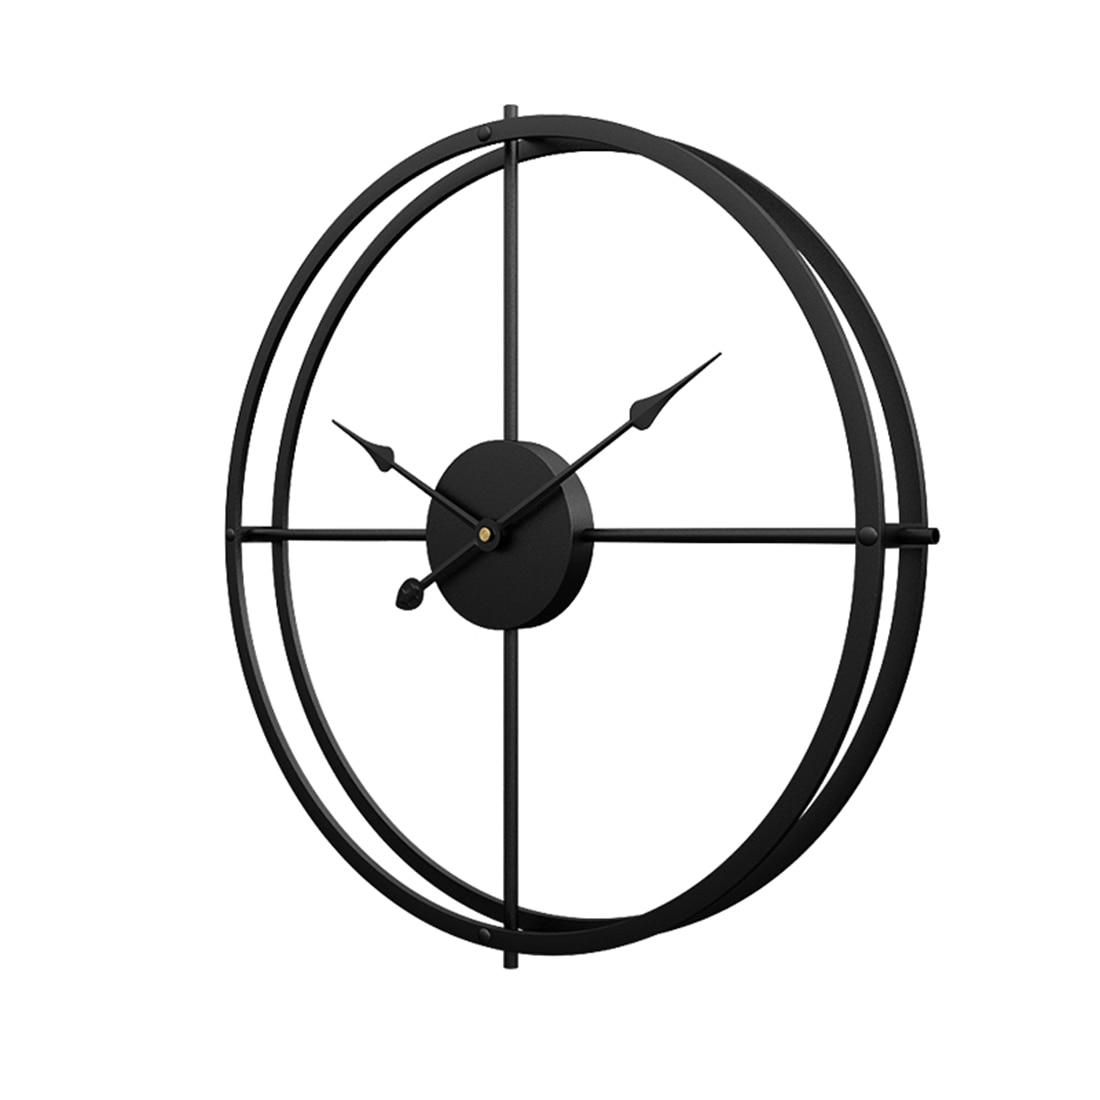 40cm /50cm  / 60cm Silent Iron Wall Clock Modern Design Clocks Home Decor Office European Style Hanging Wall Watch Clocks